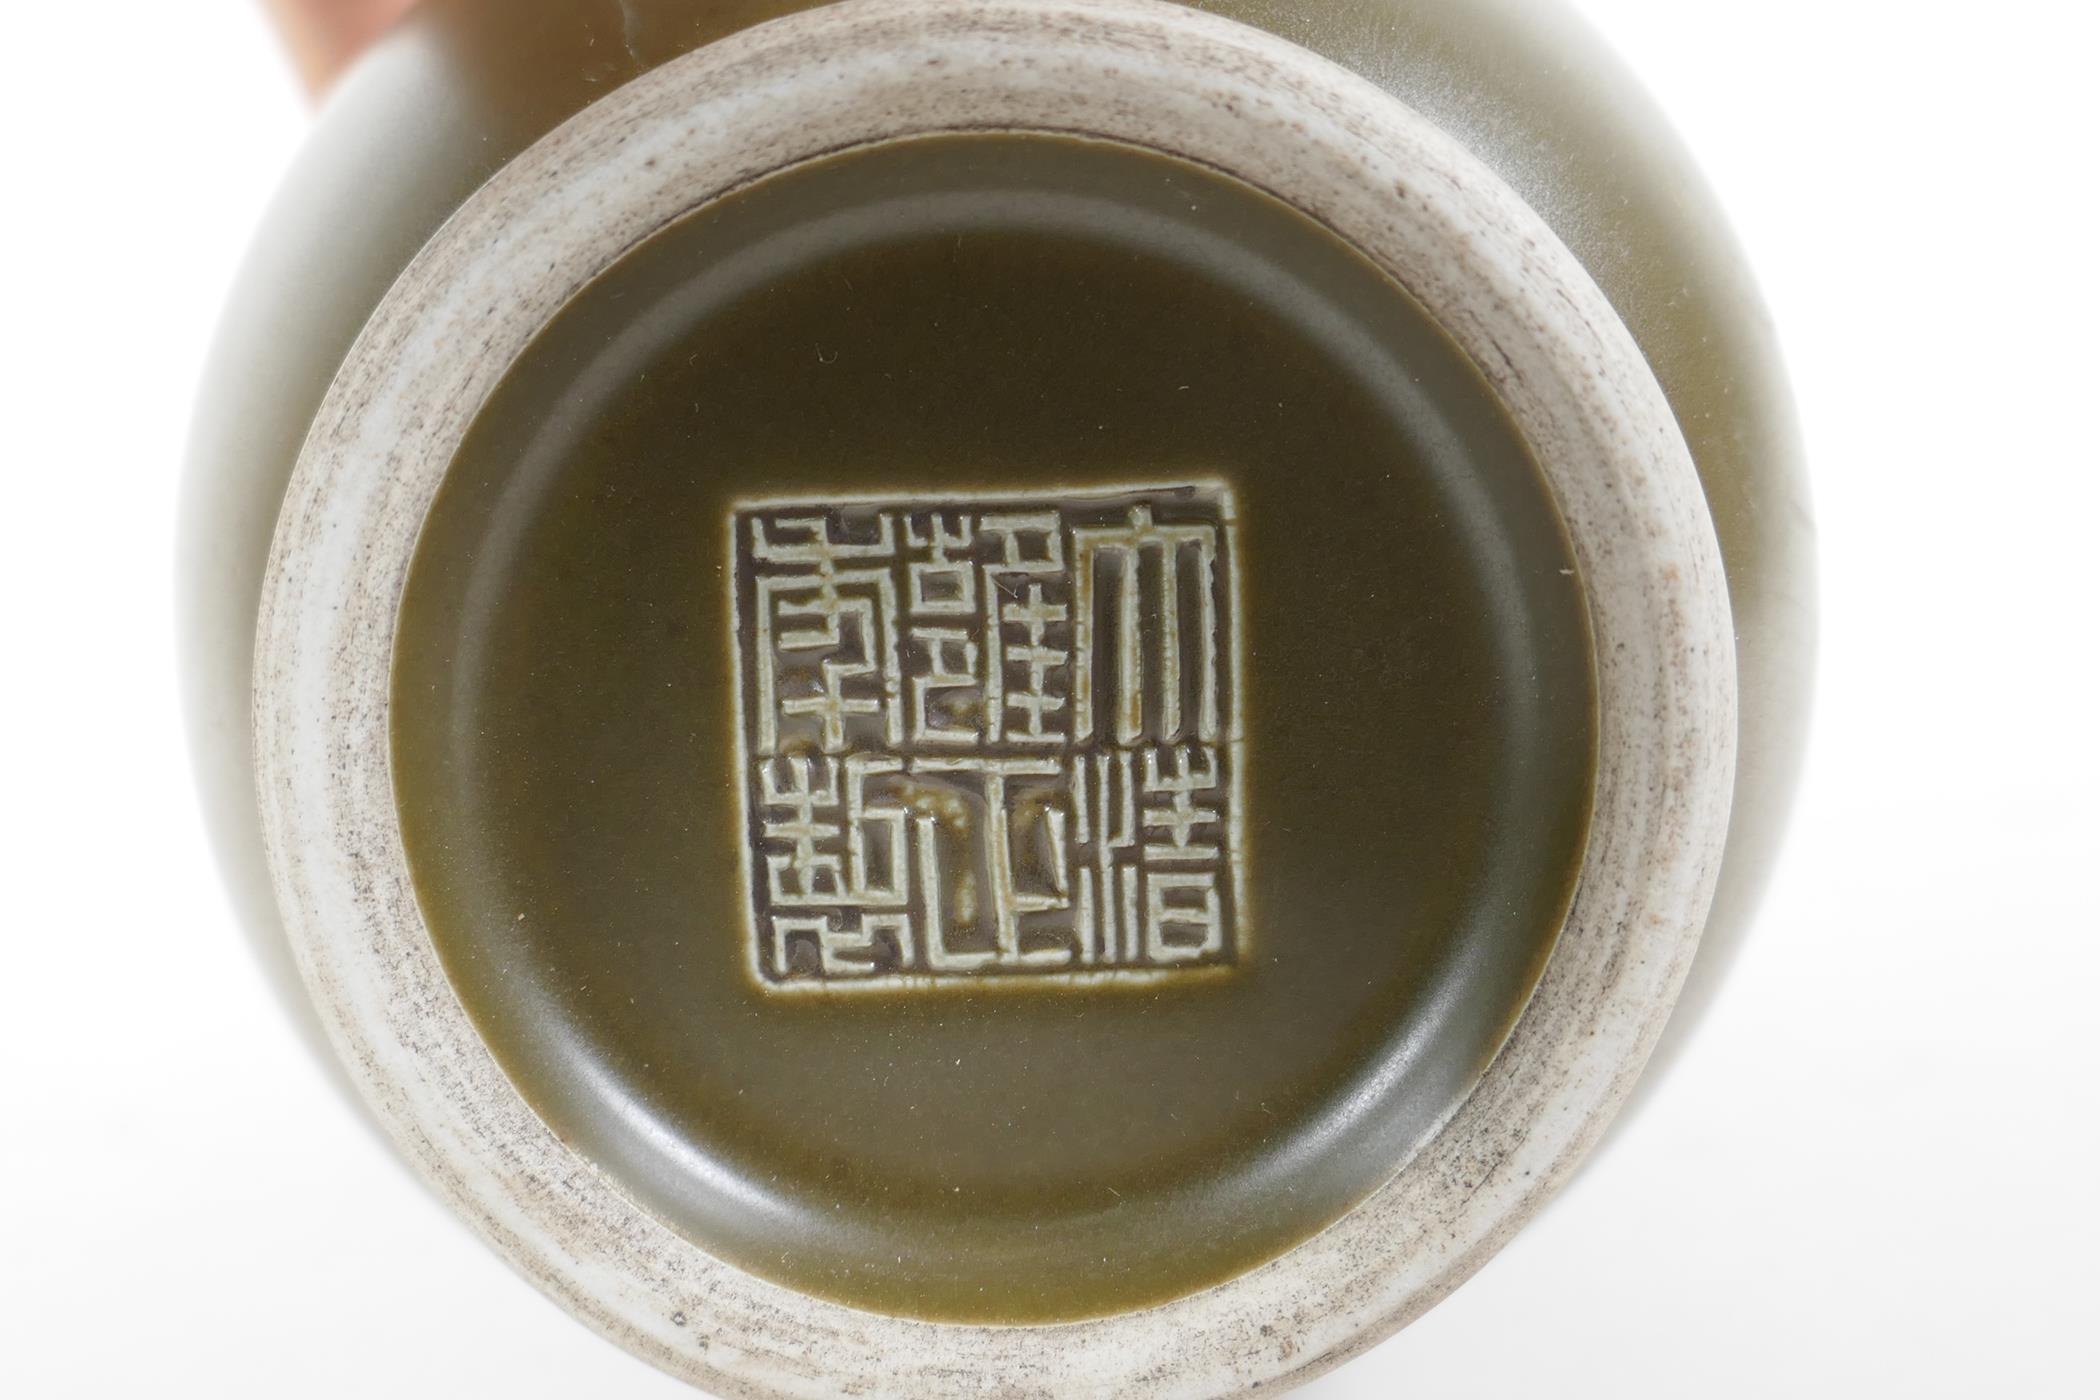 "A Chinese tea dust glazed porcelain Rouleau vase, impressed seal mark to base, 9½"" high - Image 3 of 3"